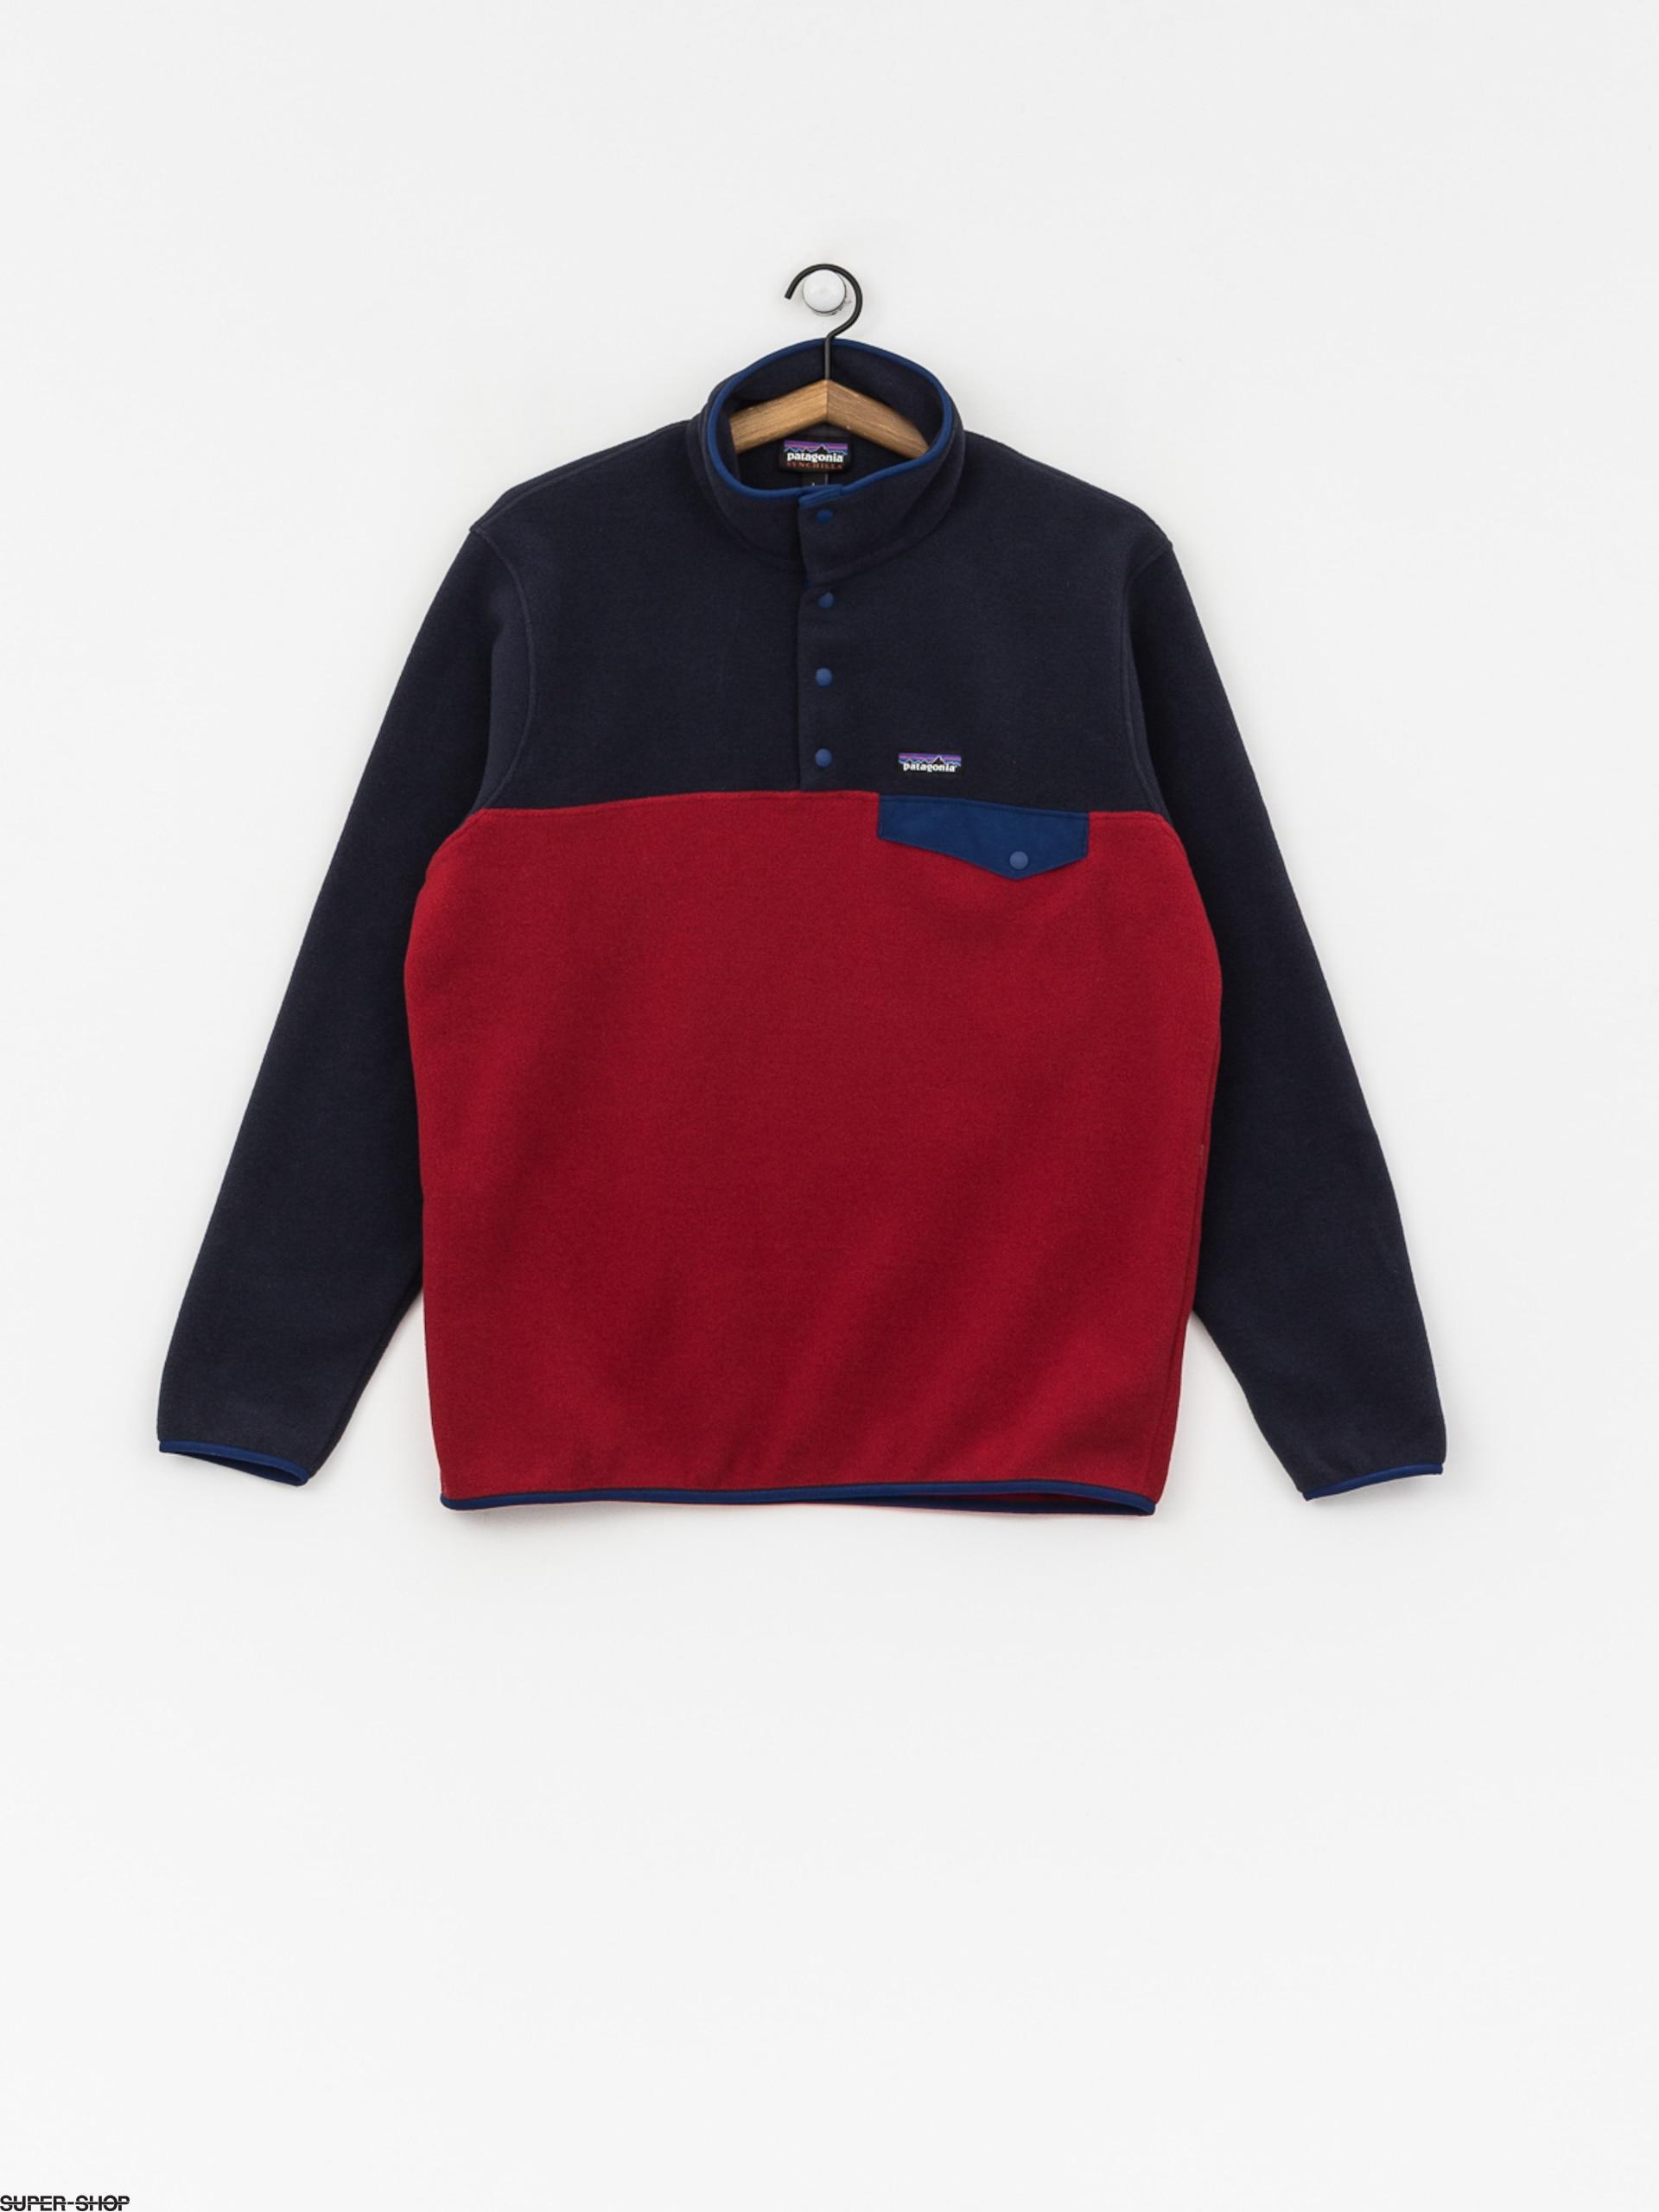 buy online 2dd35 a1cc2 Herren Patagonia Fleecejacke Synchilla Snap-T (classic red)